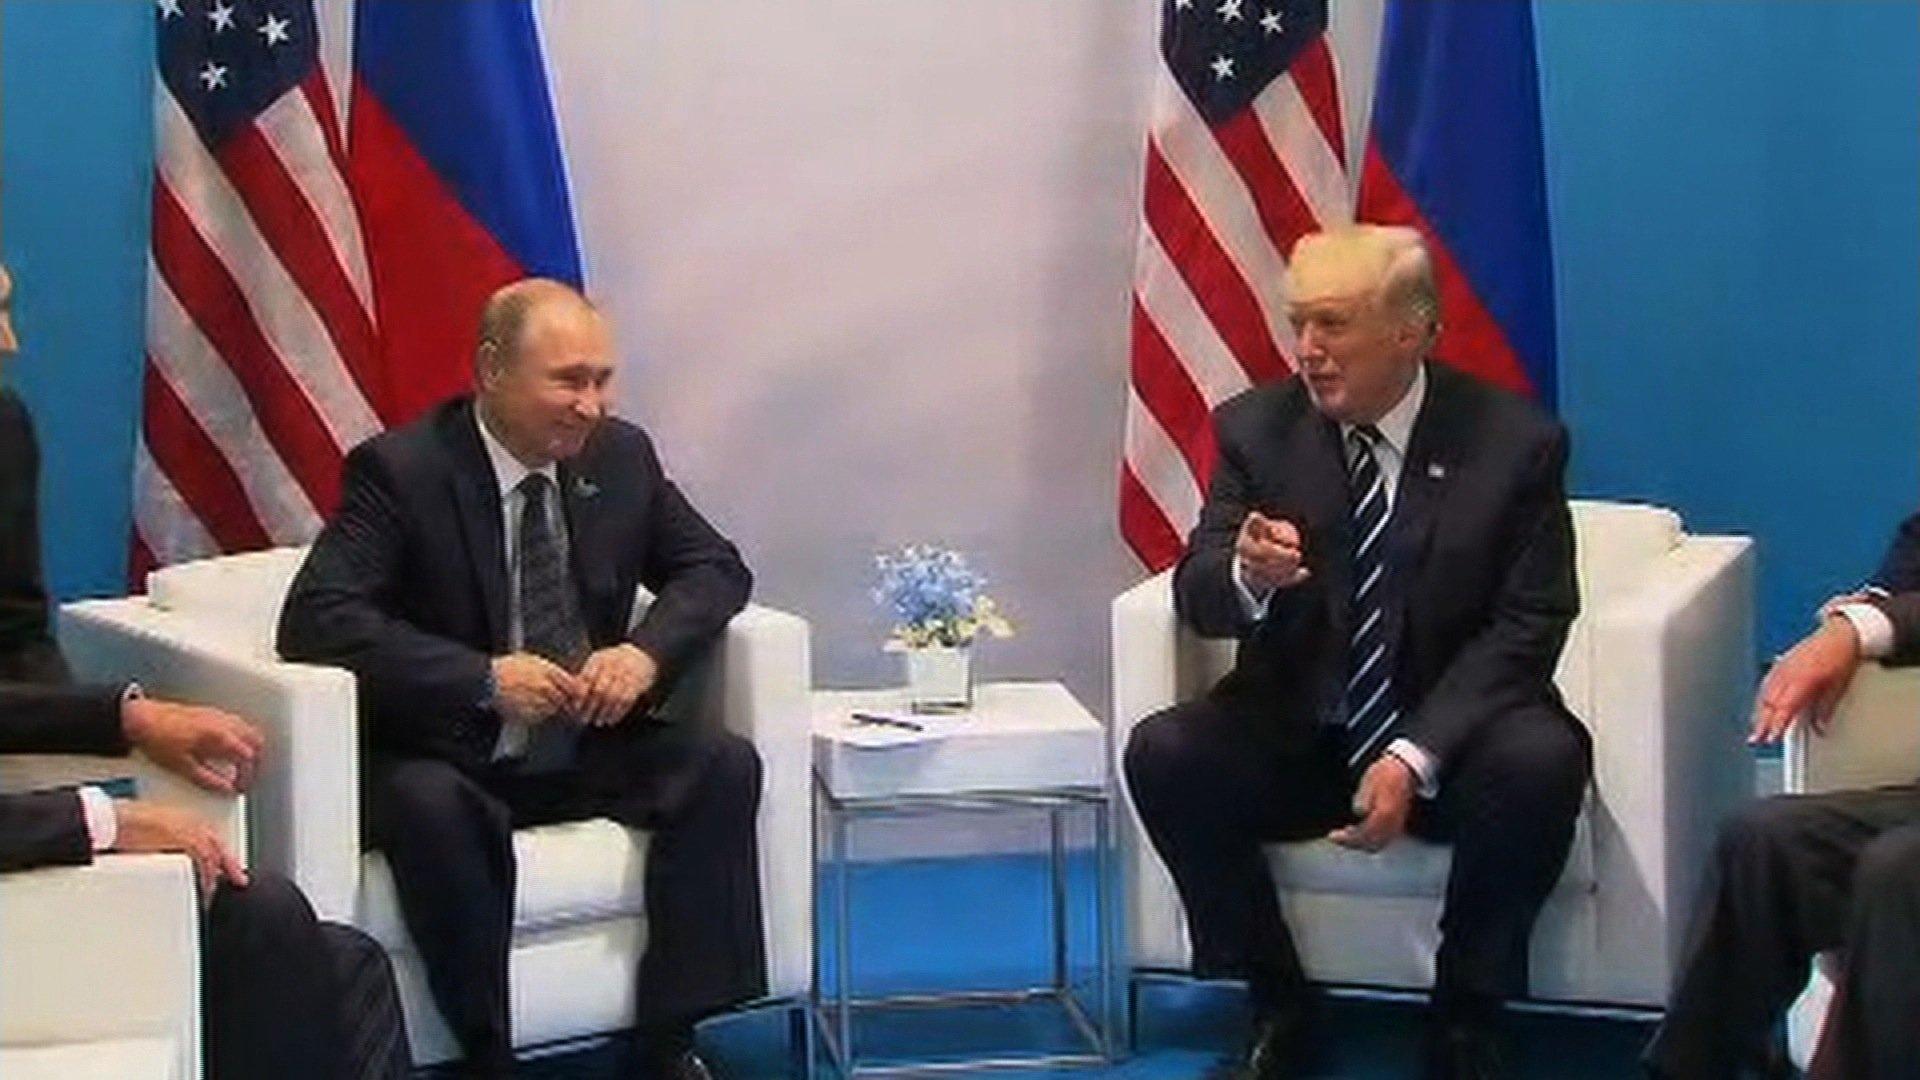 Grand jury assembled in Trump - Russia investigation as clock ticks for Trump